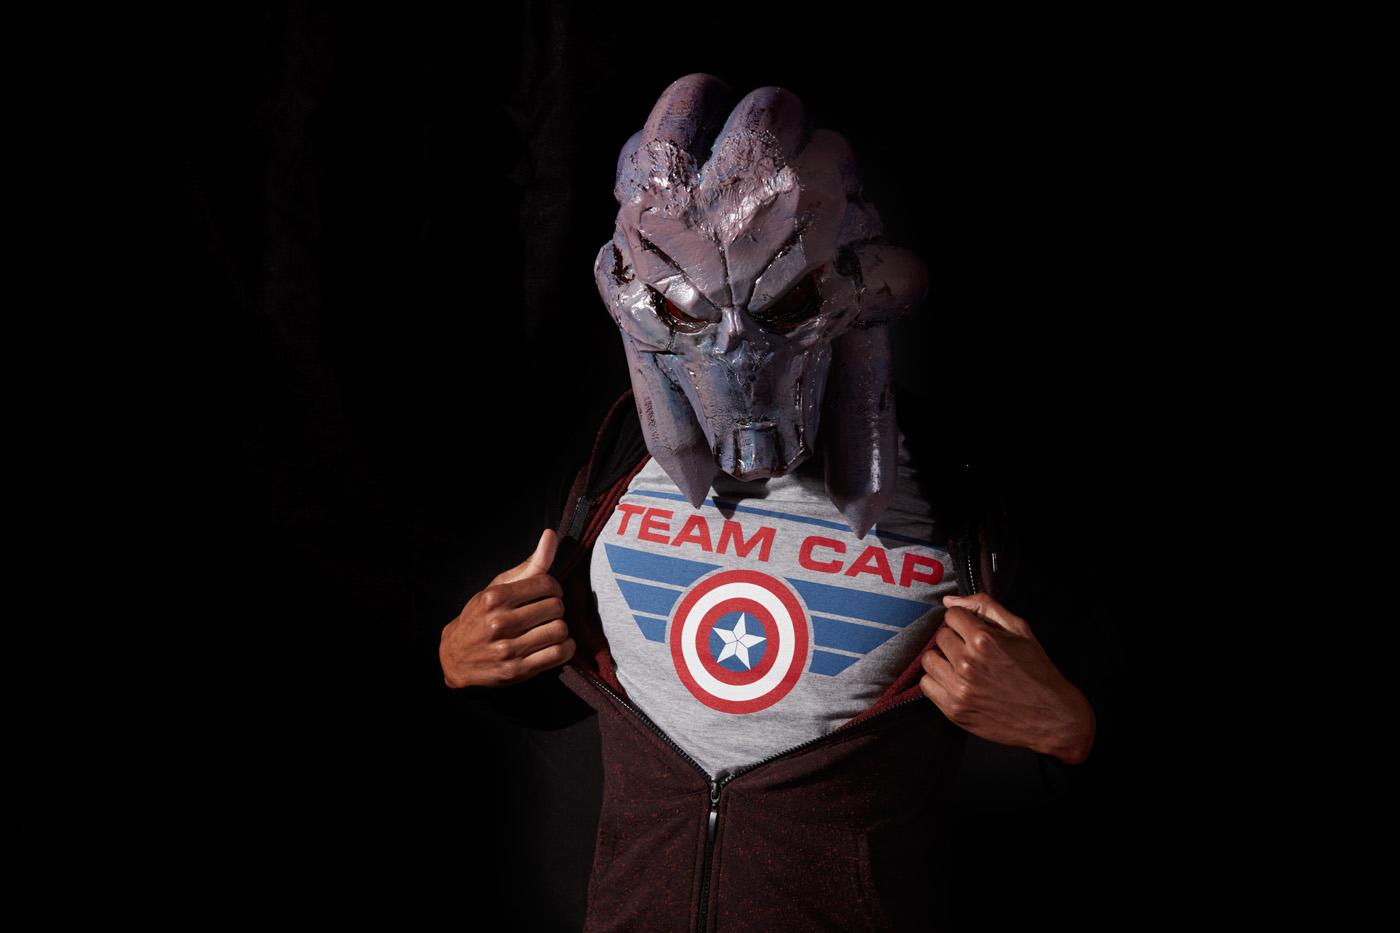 Hive cosplay